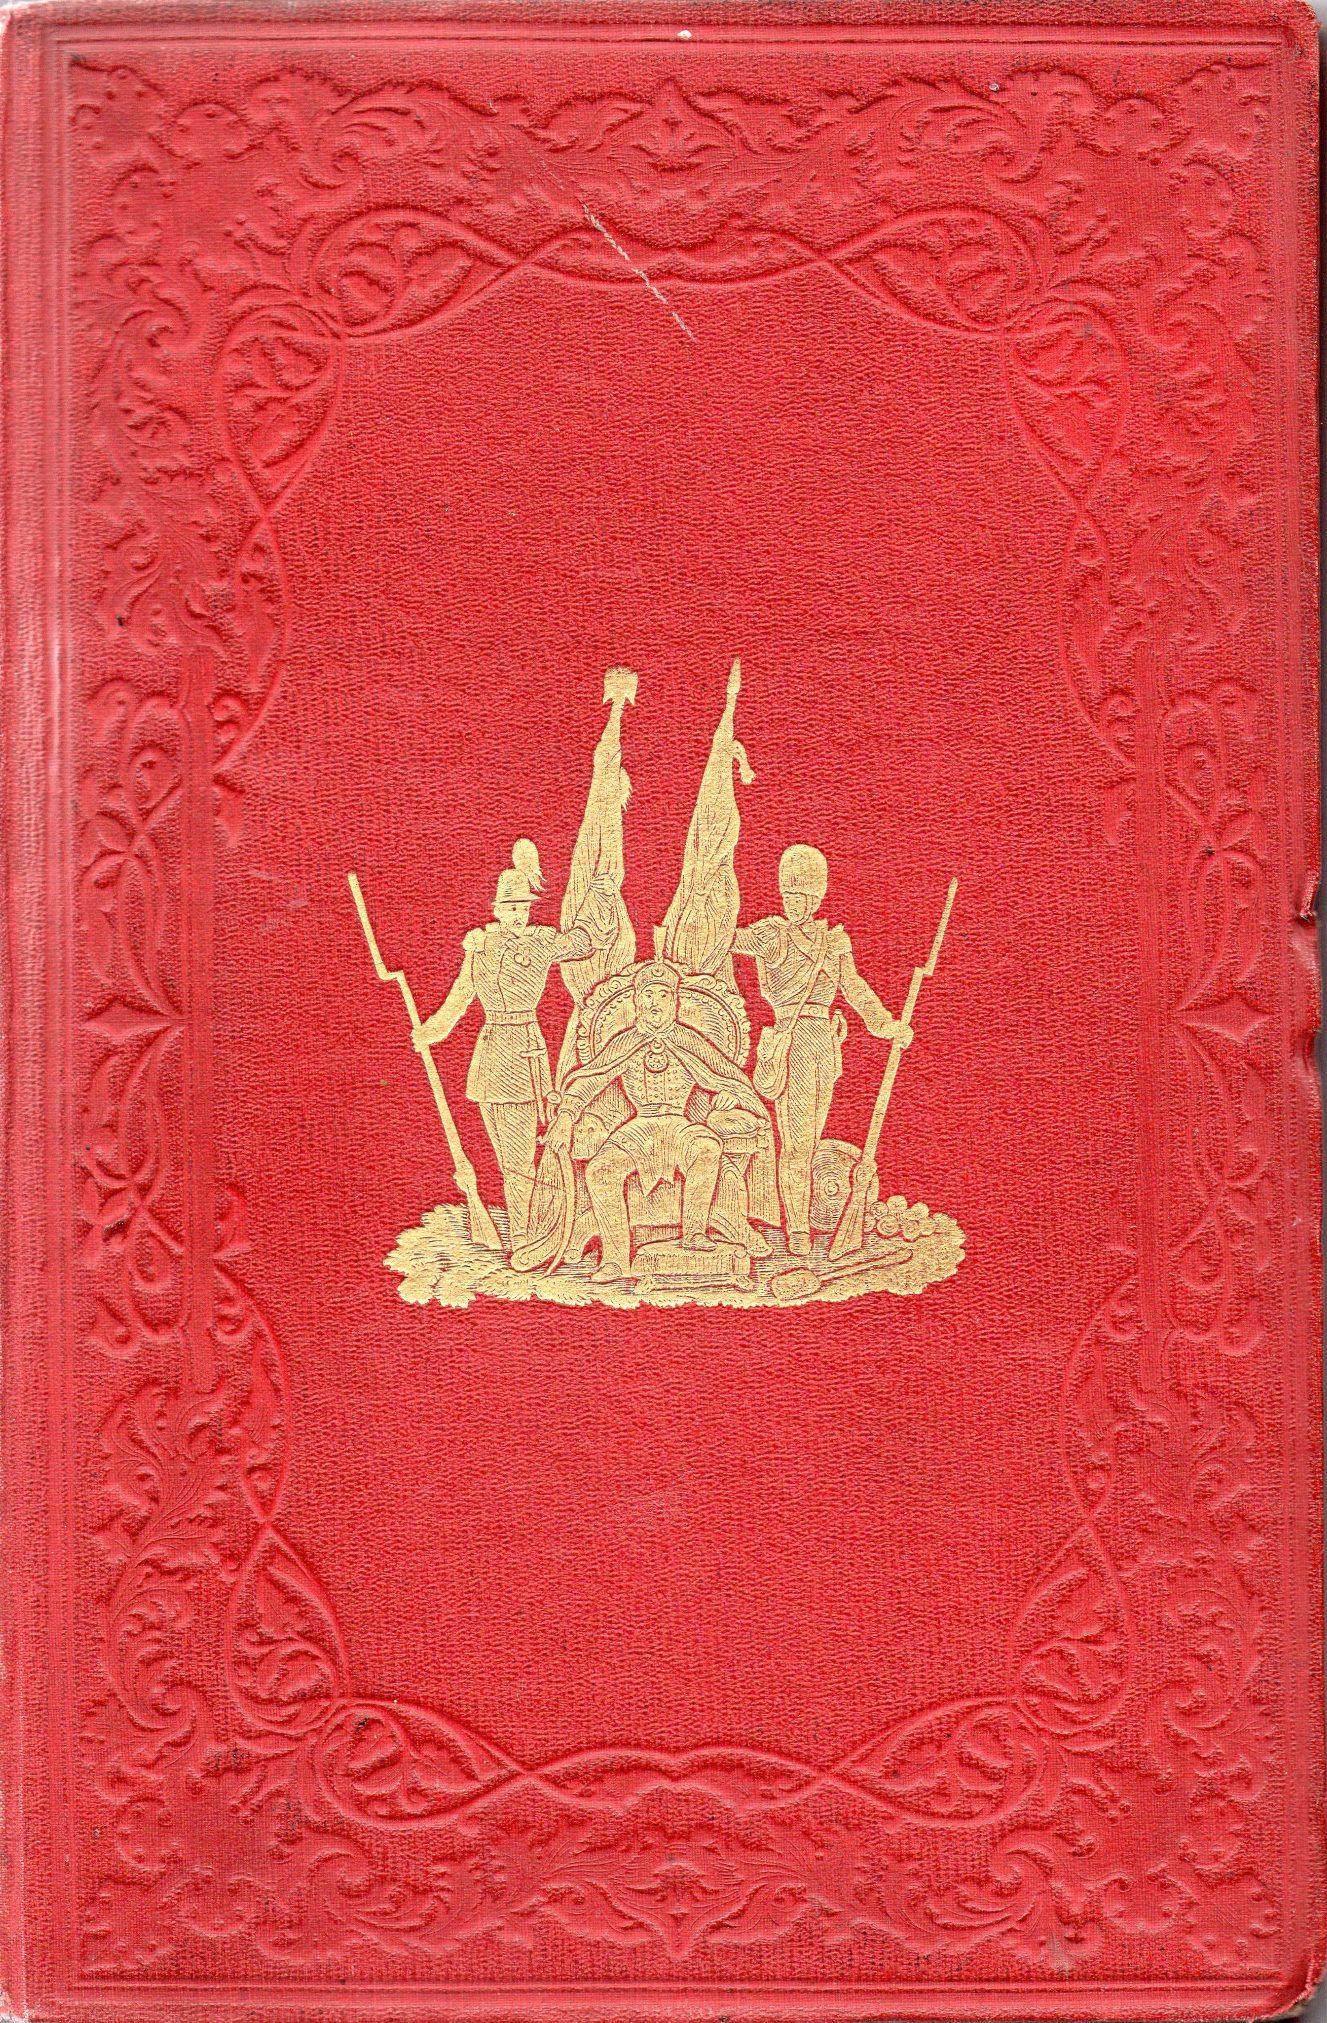 "Книга ""Nolan E. H. "" The history of the War Against Russia. Illustrated. Т. V"" / Нолан Е. ""Історія війни проти Росії. Ілюстрована. Т. V"""